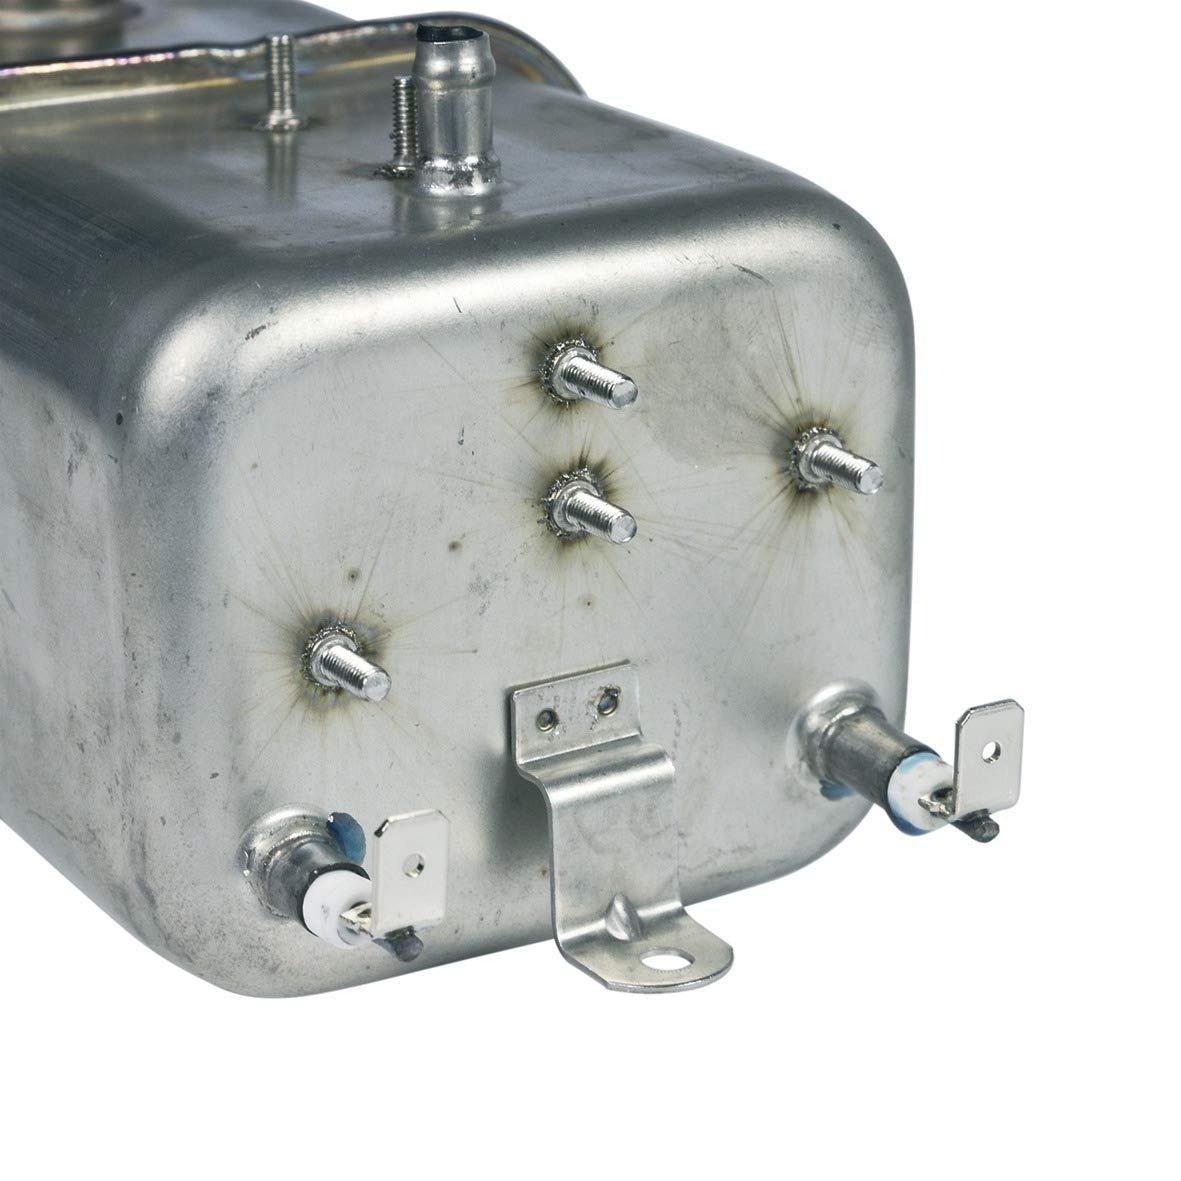 Heizelement Bosch 12008374 Heizkörper 1500W 230V für Dampfbügelstation